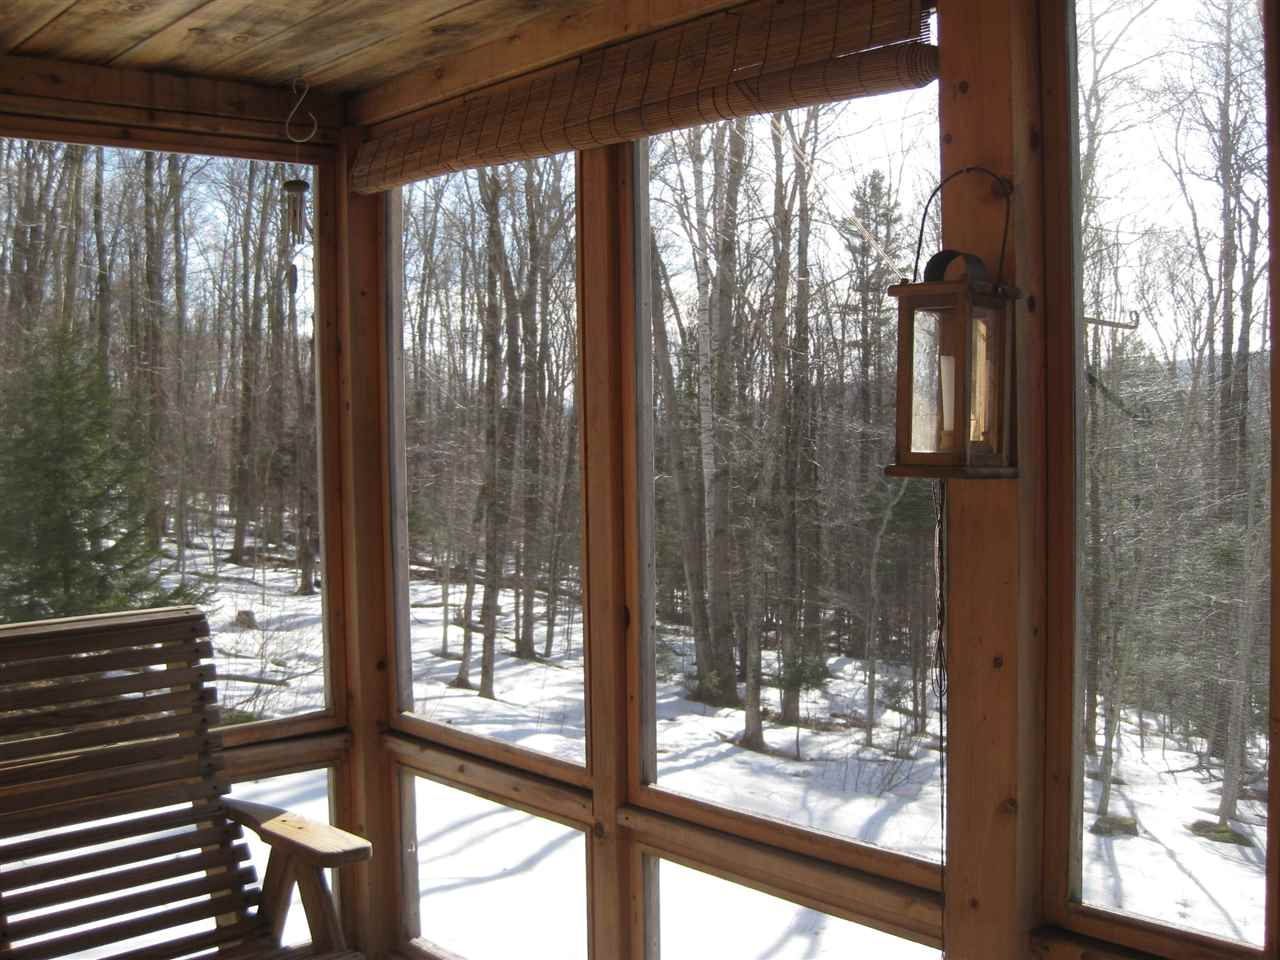 Mount-Snow-Real-Estate-4623147-19